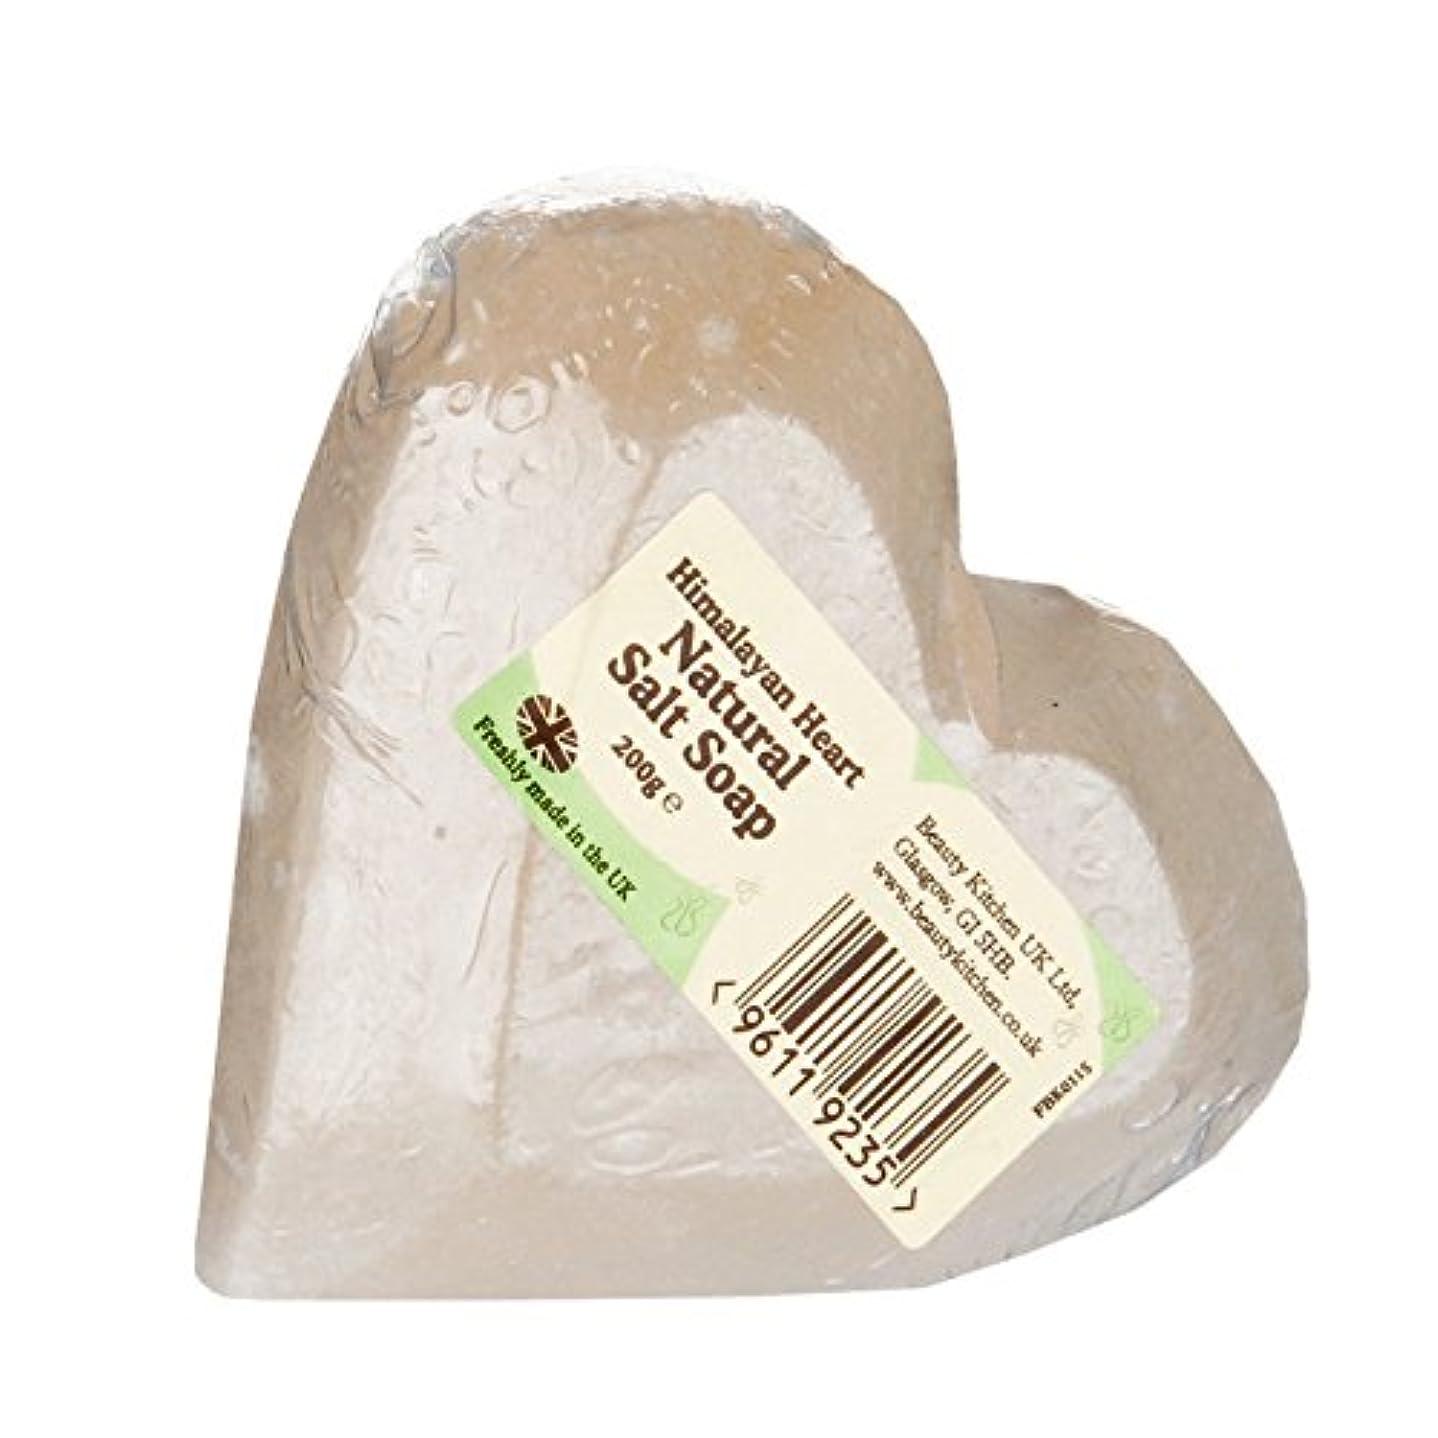 Beauty Kitchen Himalayan Heart Soap 200g (Pack of 6) - 美容キッチンヒマラヤンハートソープ200グラム (x6) [並行輸入品]